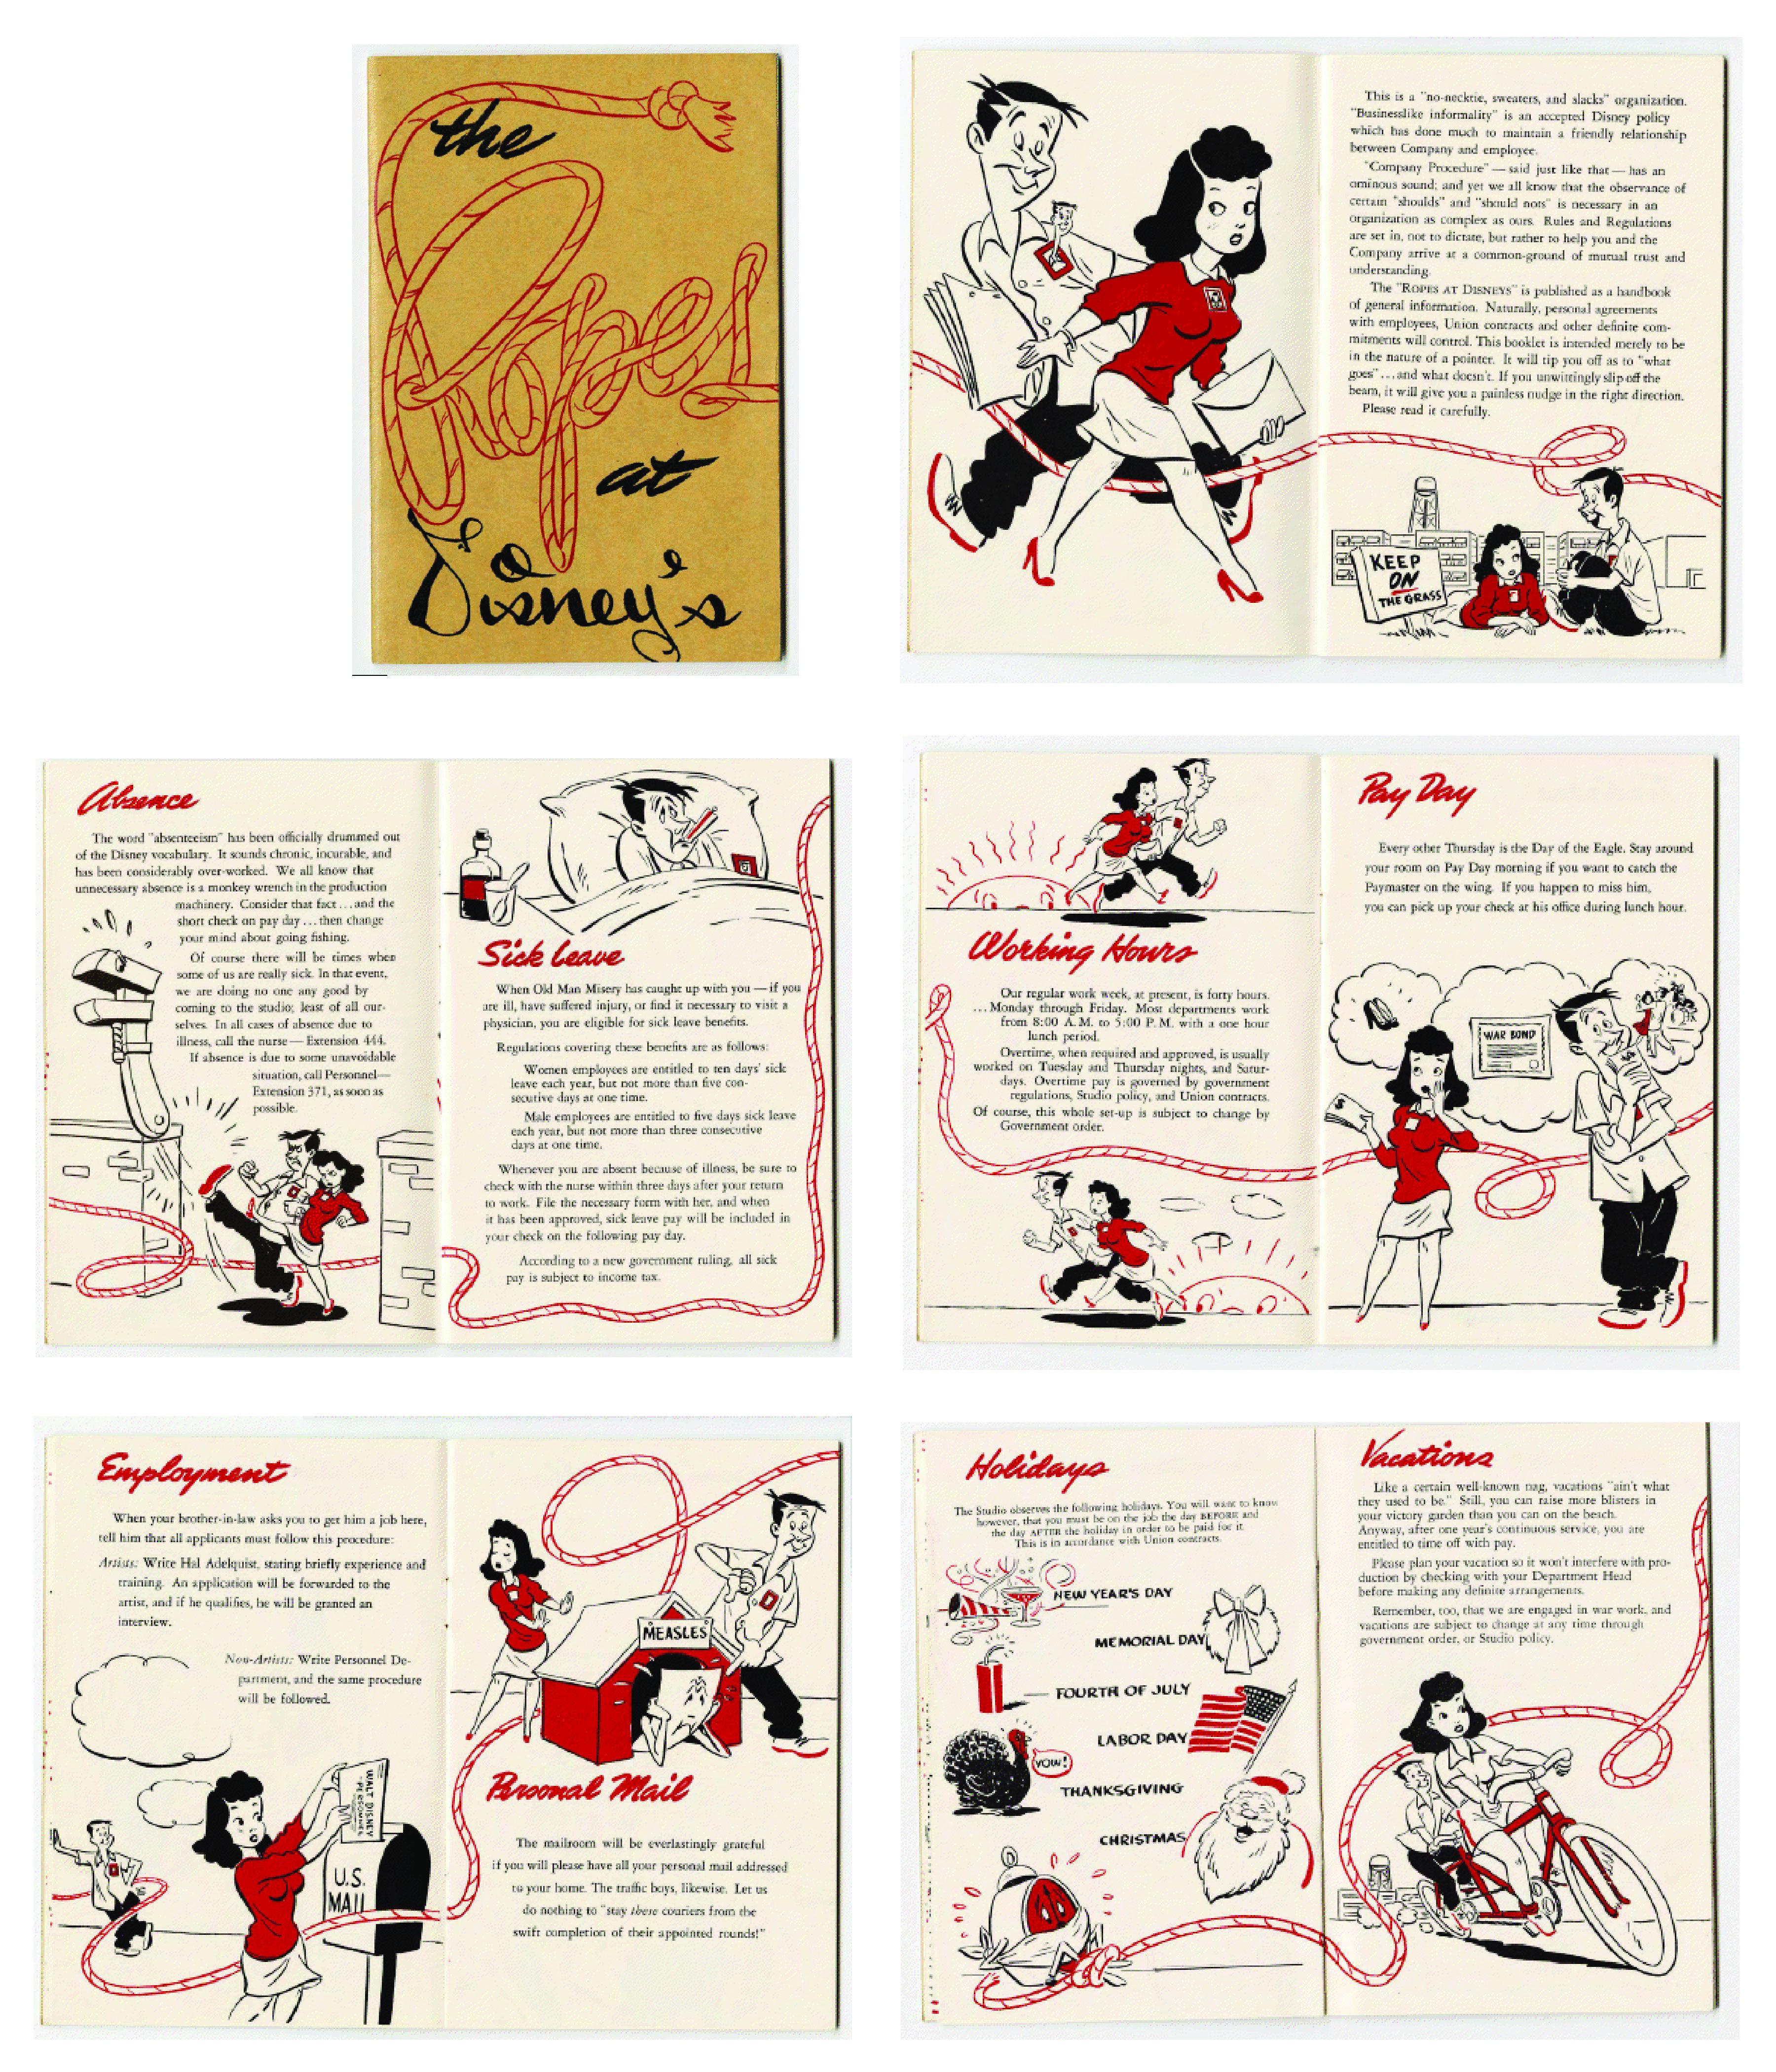 Disney Employee Handbook  Fun Via Quipsologies  Vintage